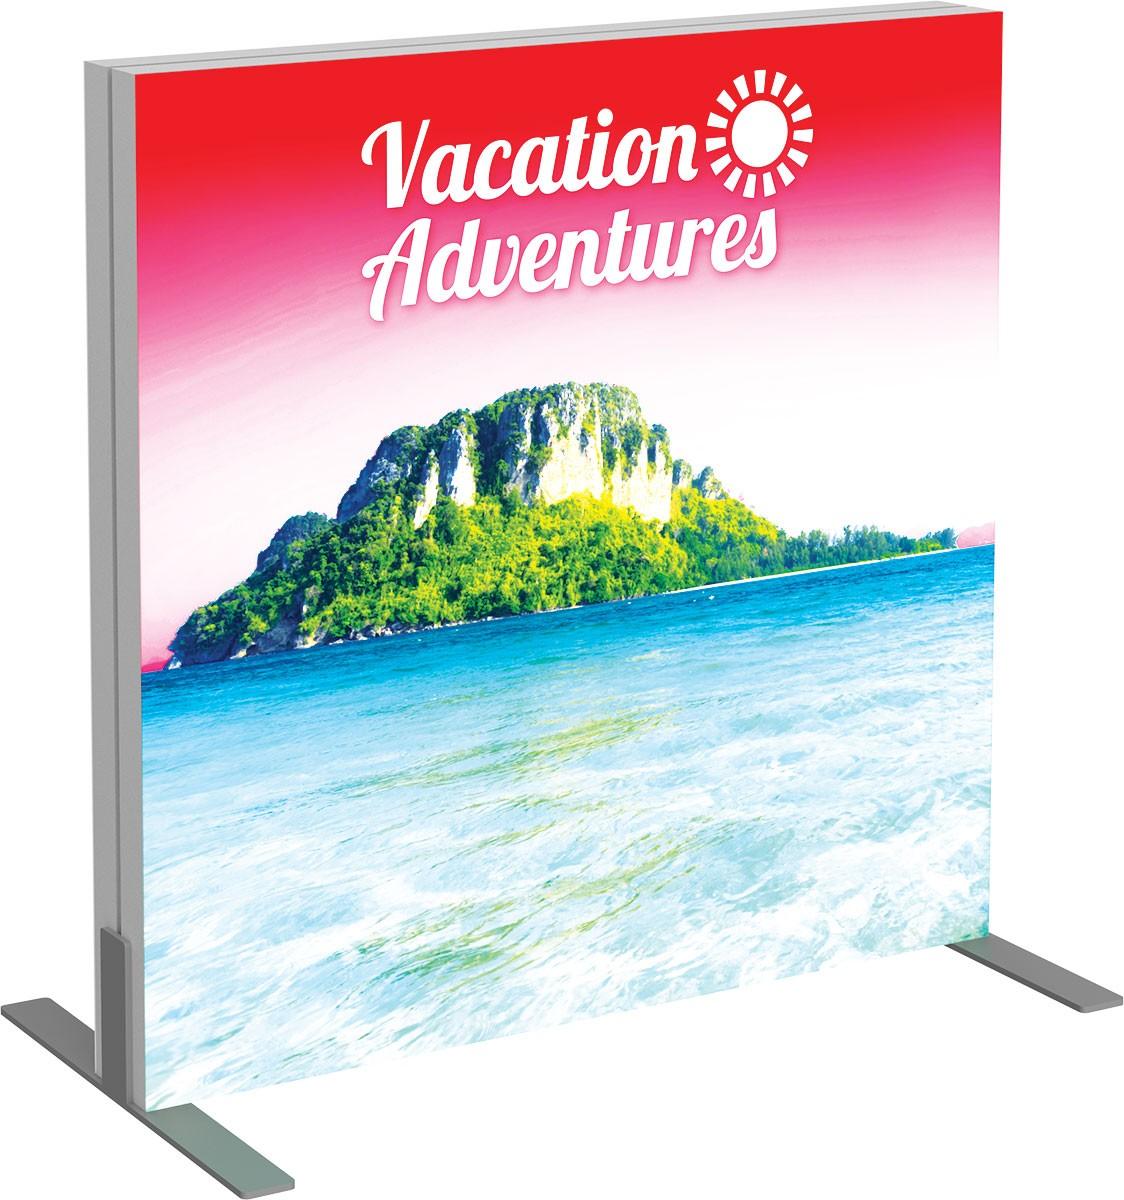 Vector Frame Backlit Display 3x3 Illuminated Tension Fabric Display